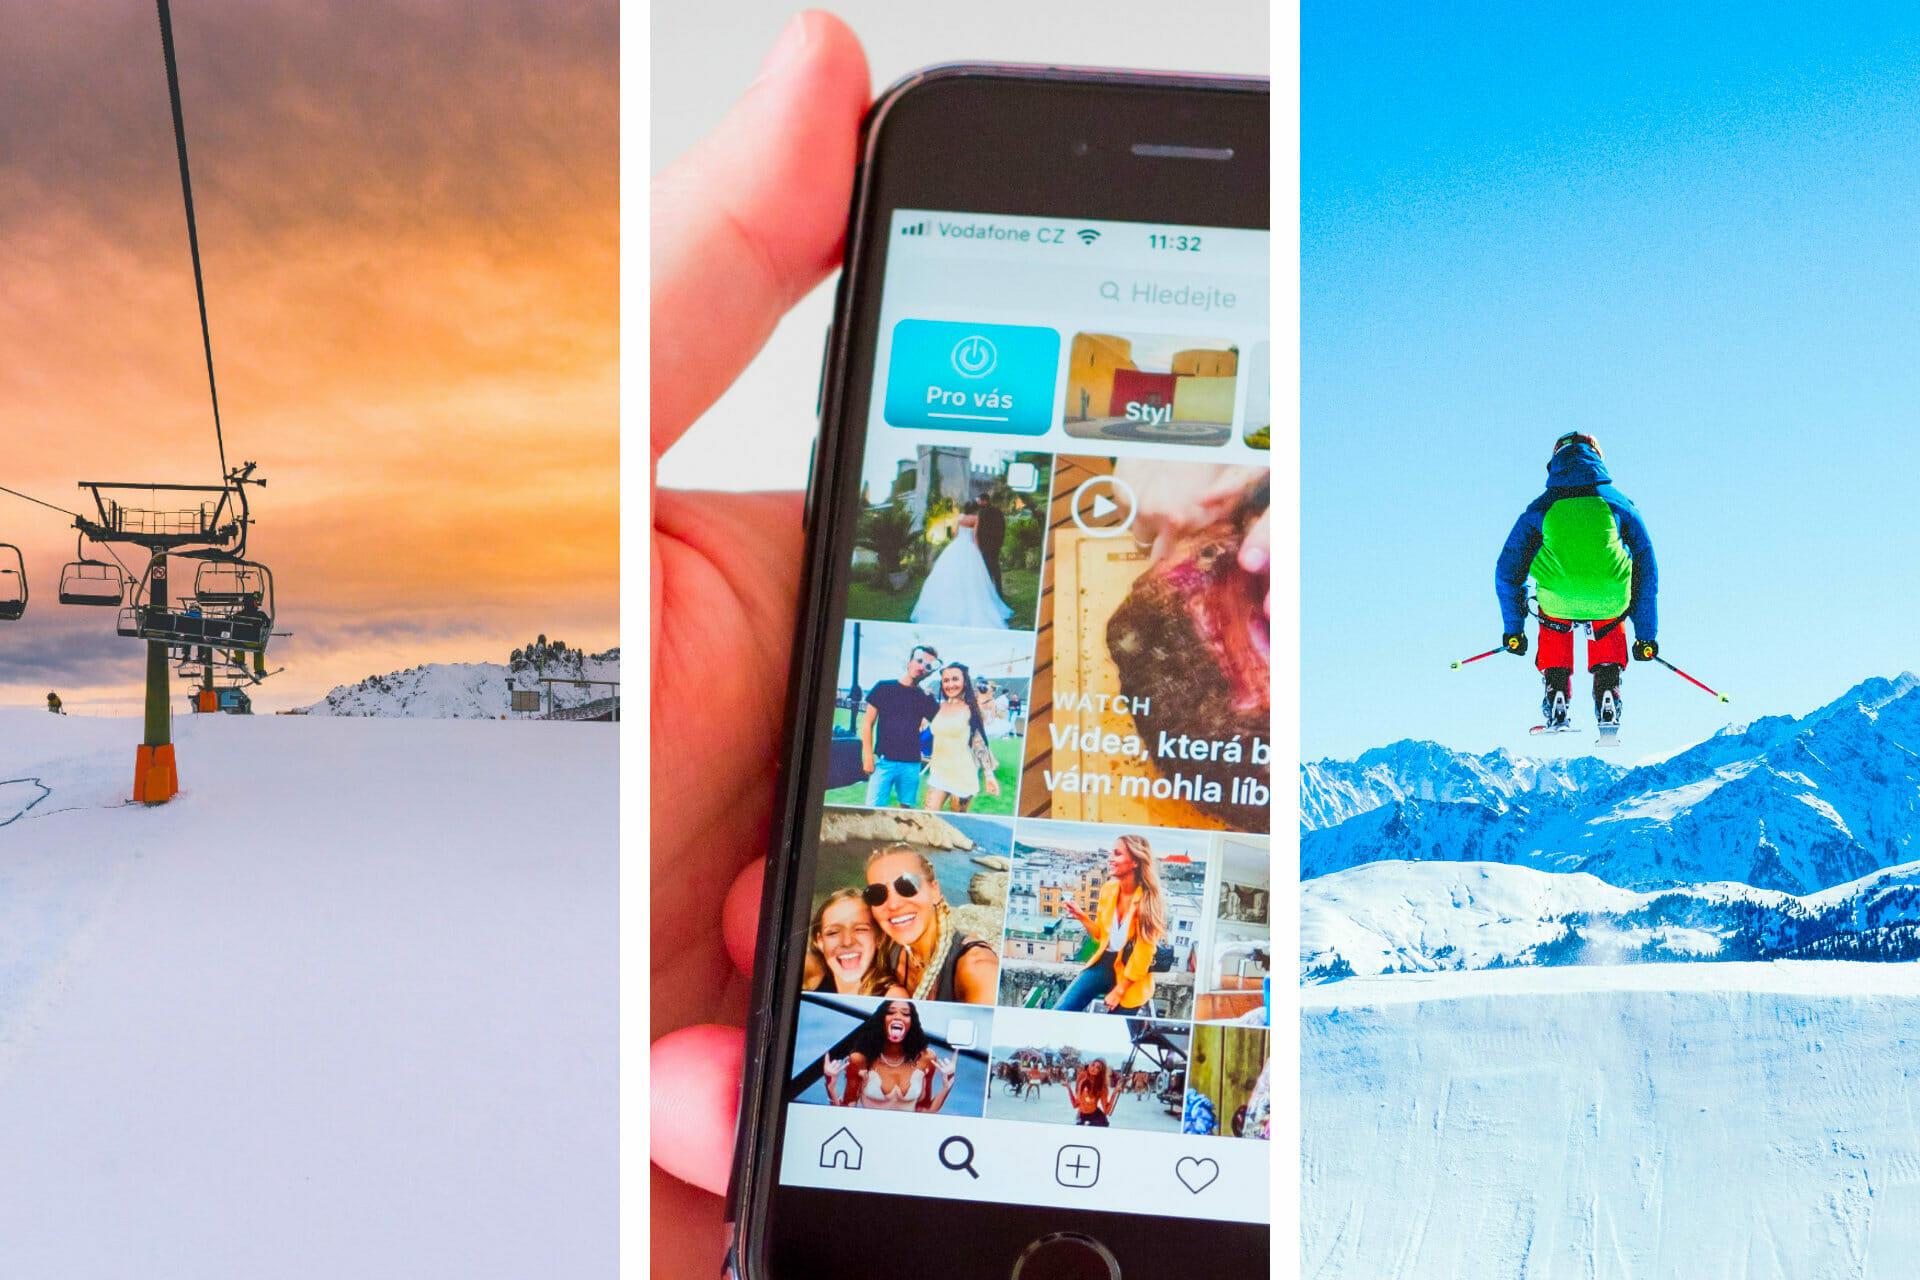 75 Unique Skiing Instagram Captions for the Perfect Post via @allamericanatlas